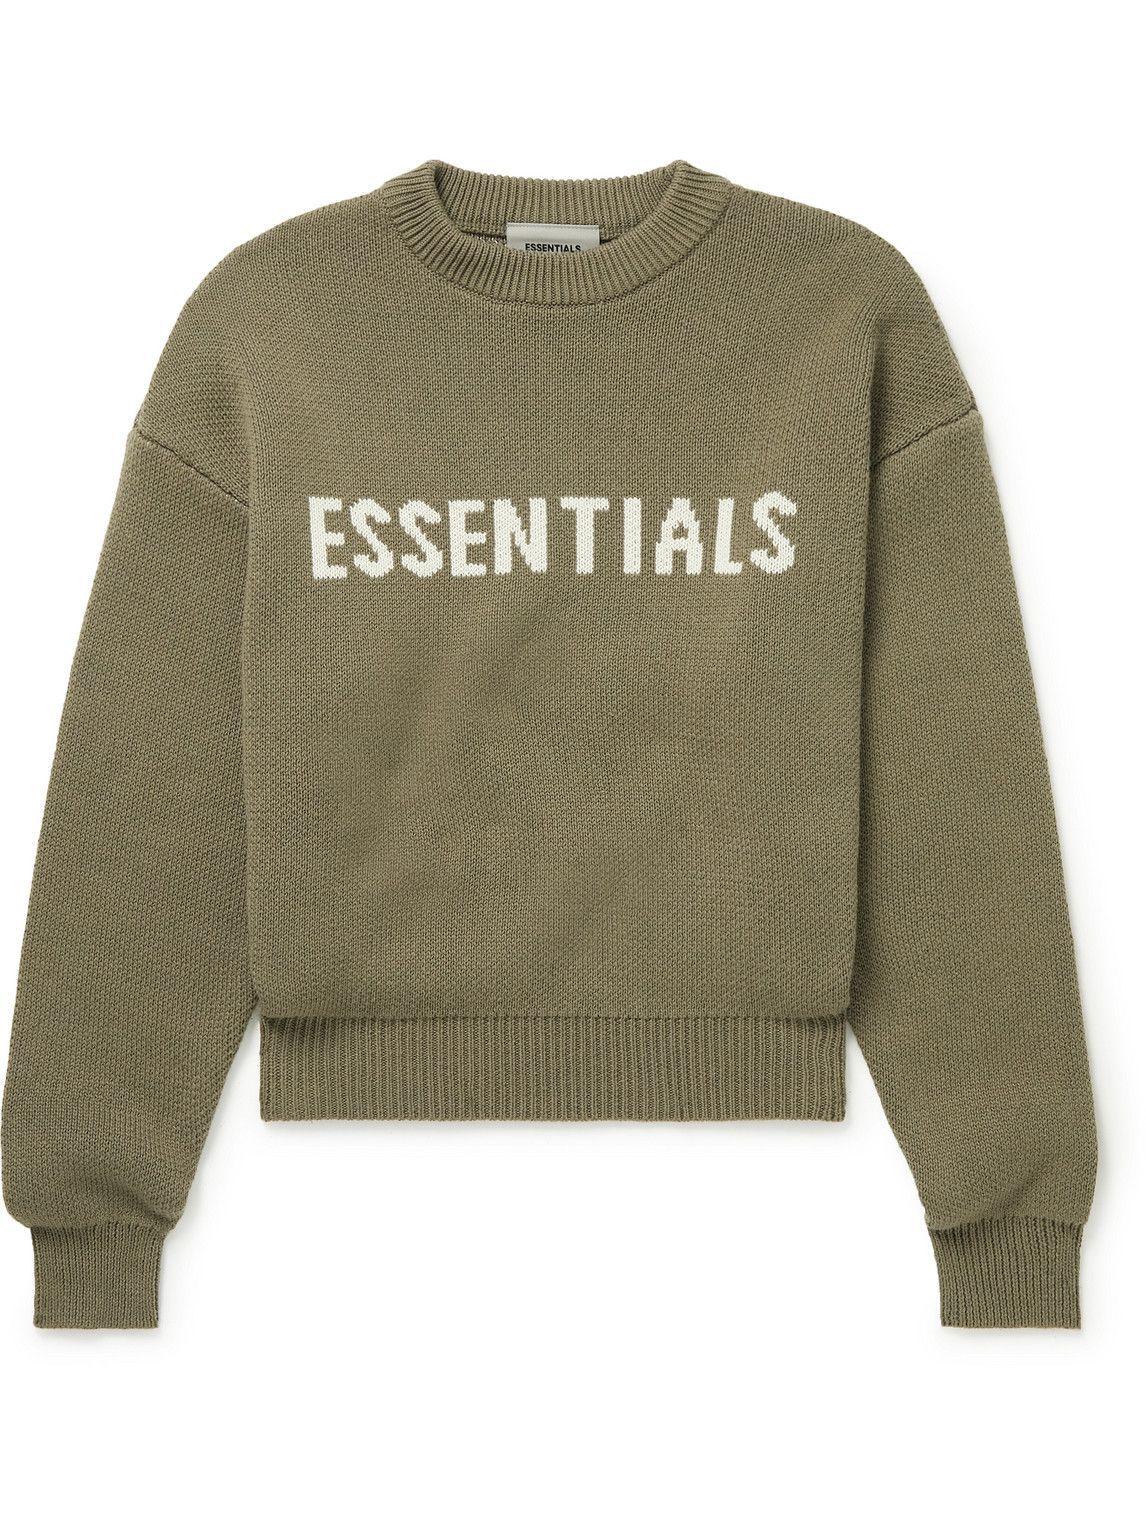 Photo: Fear of God Essentials Kids - Logo-Intarsia Cotton-Blend Sweater - Brown